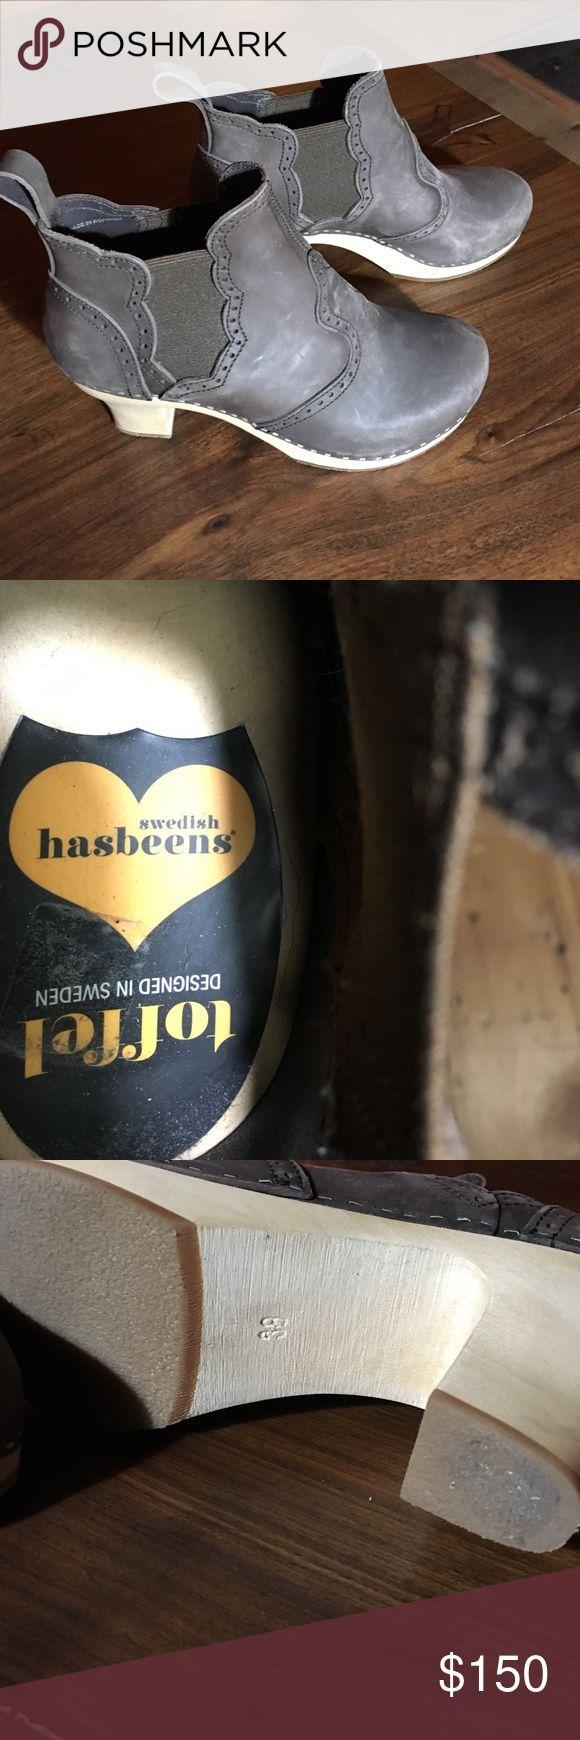 Swedish Hasbeens clog boot New never worn Swedish clog by Hasbeens Hasbeens Shoes Heeled Boots